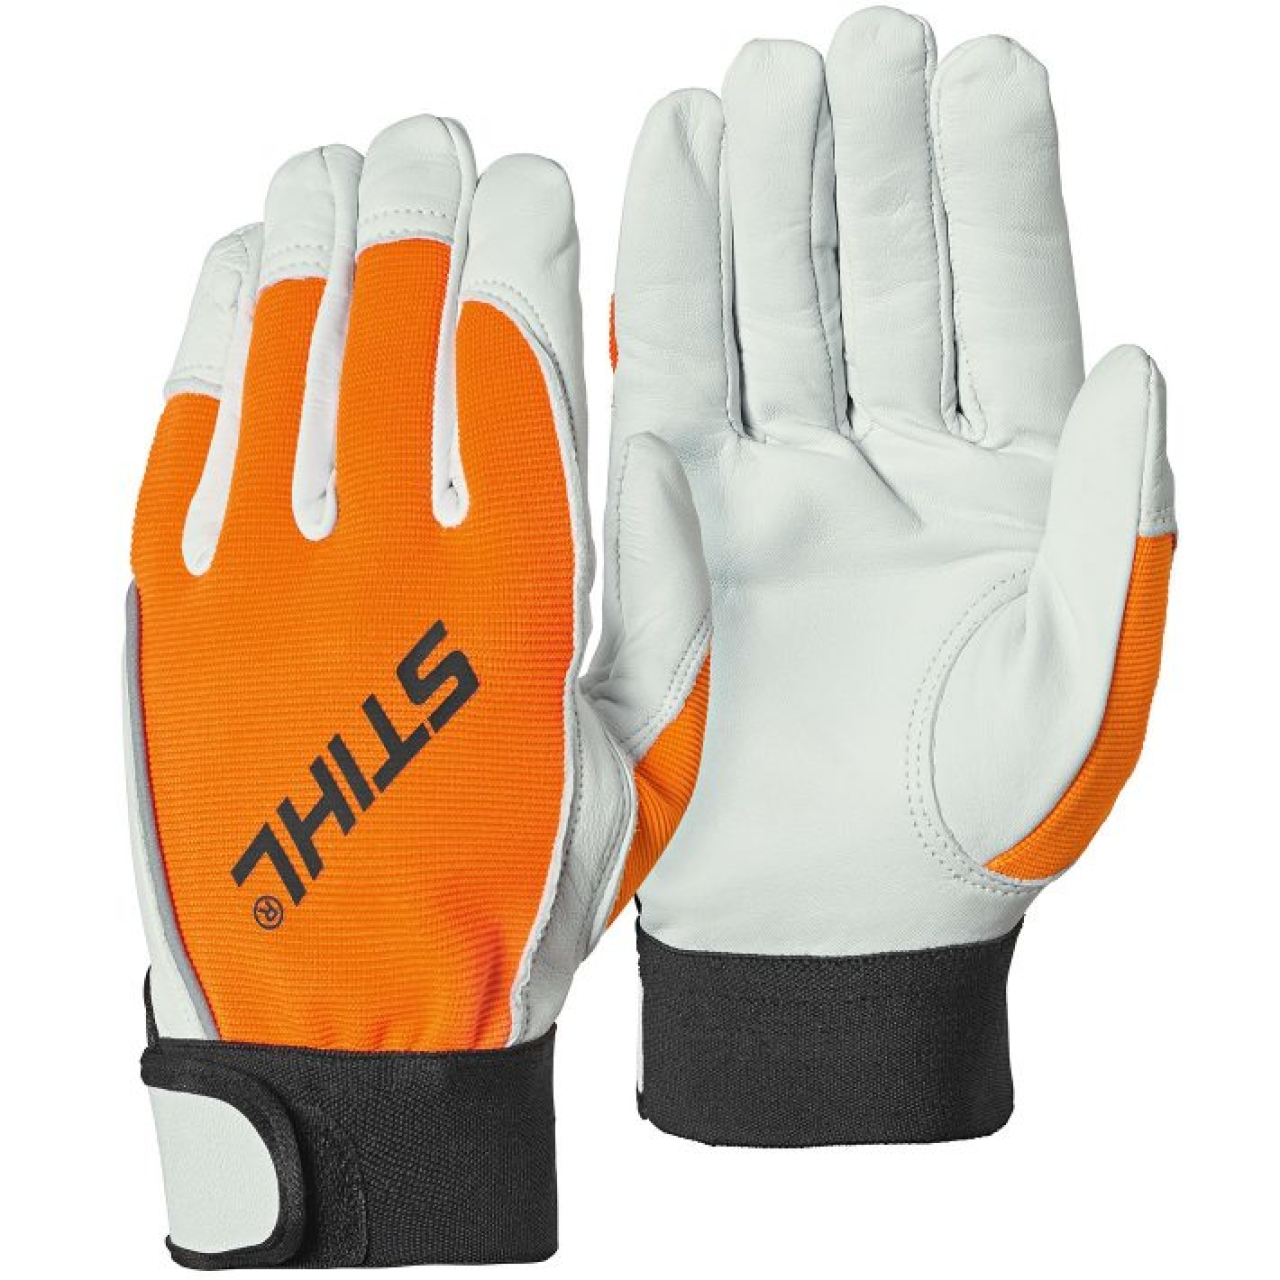 Handschuh DYNAMIC SensoLight